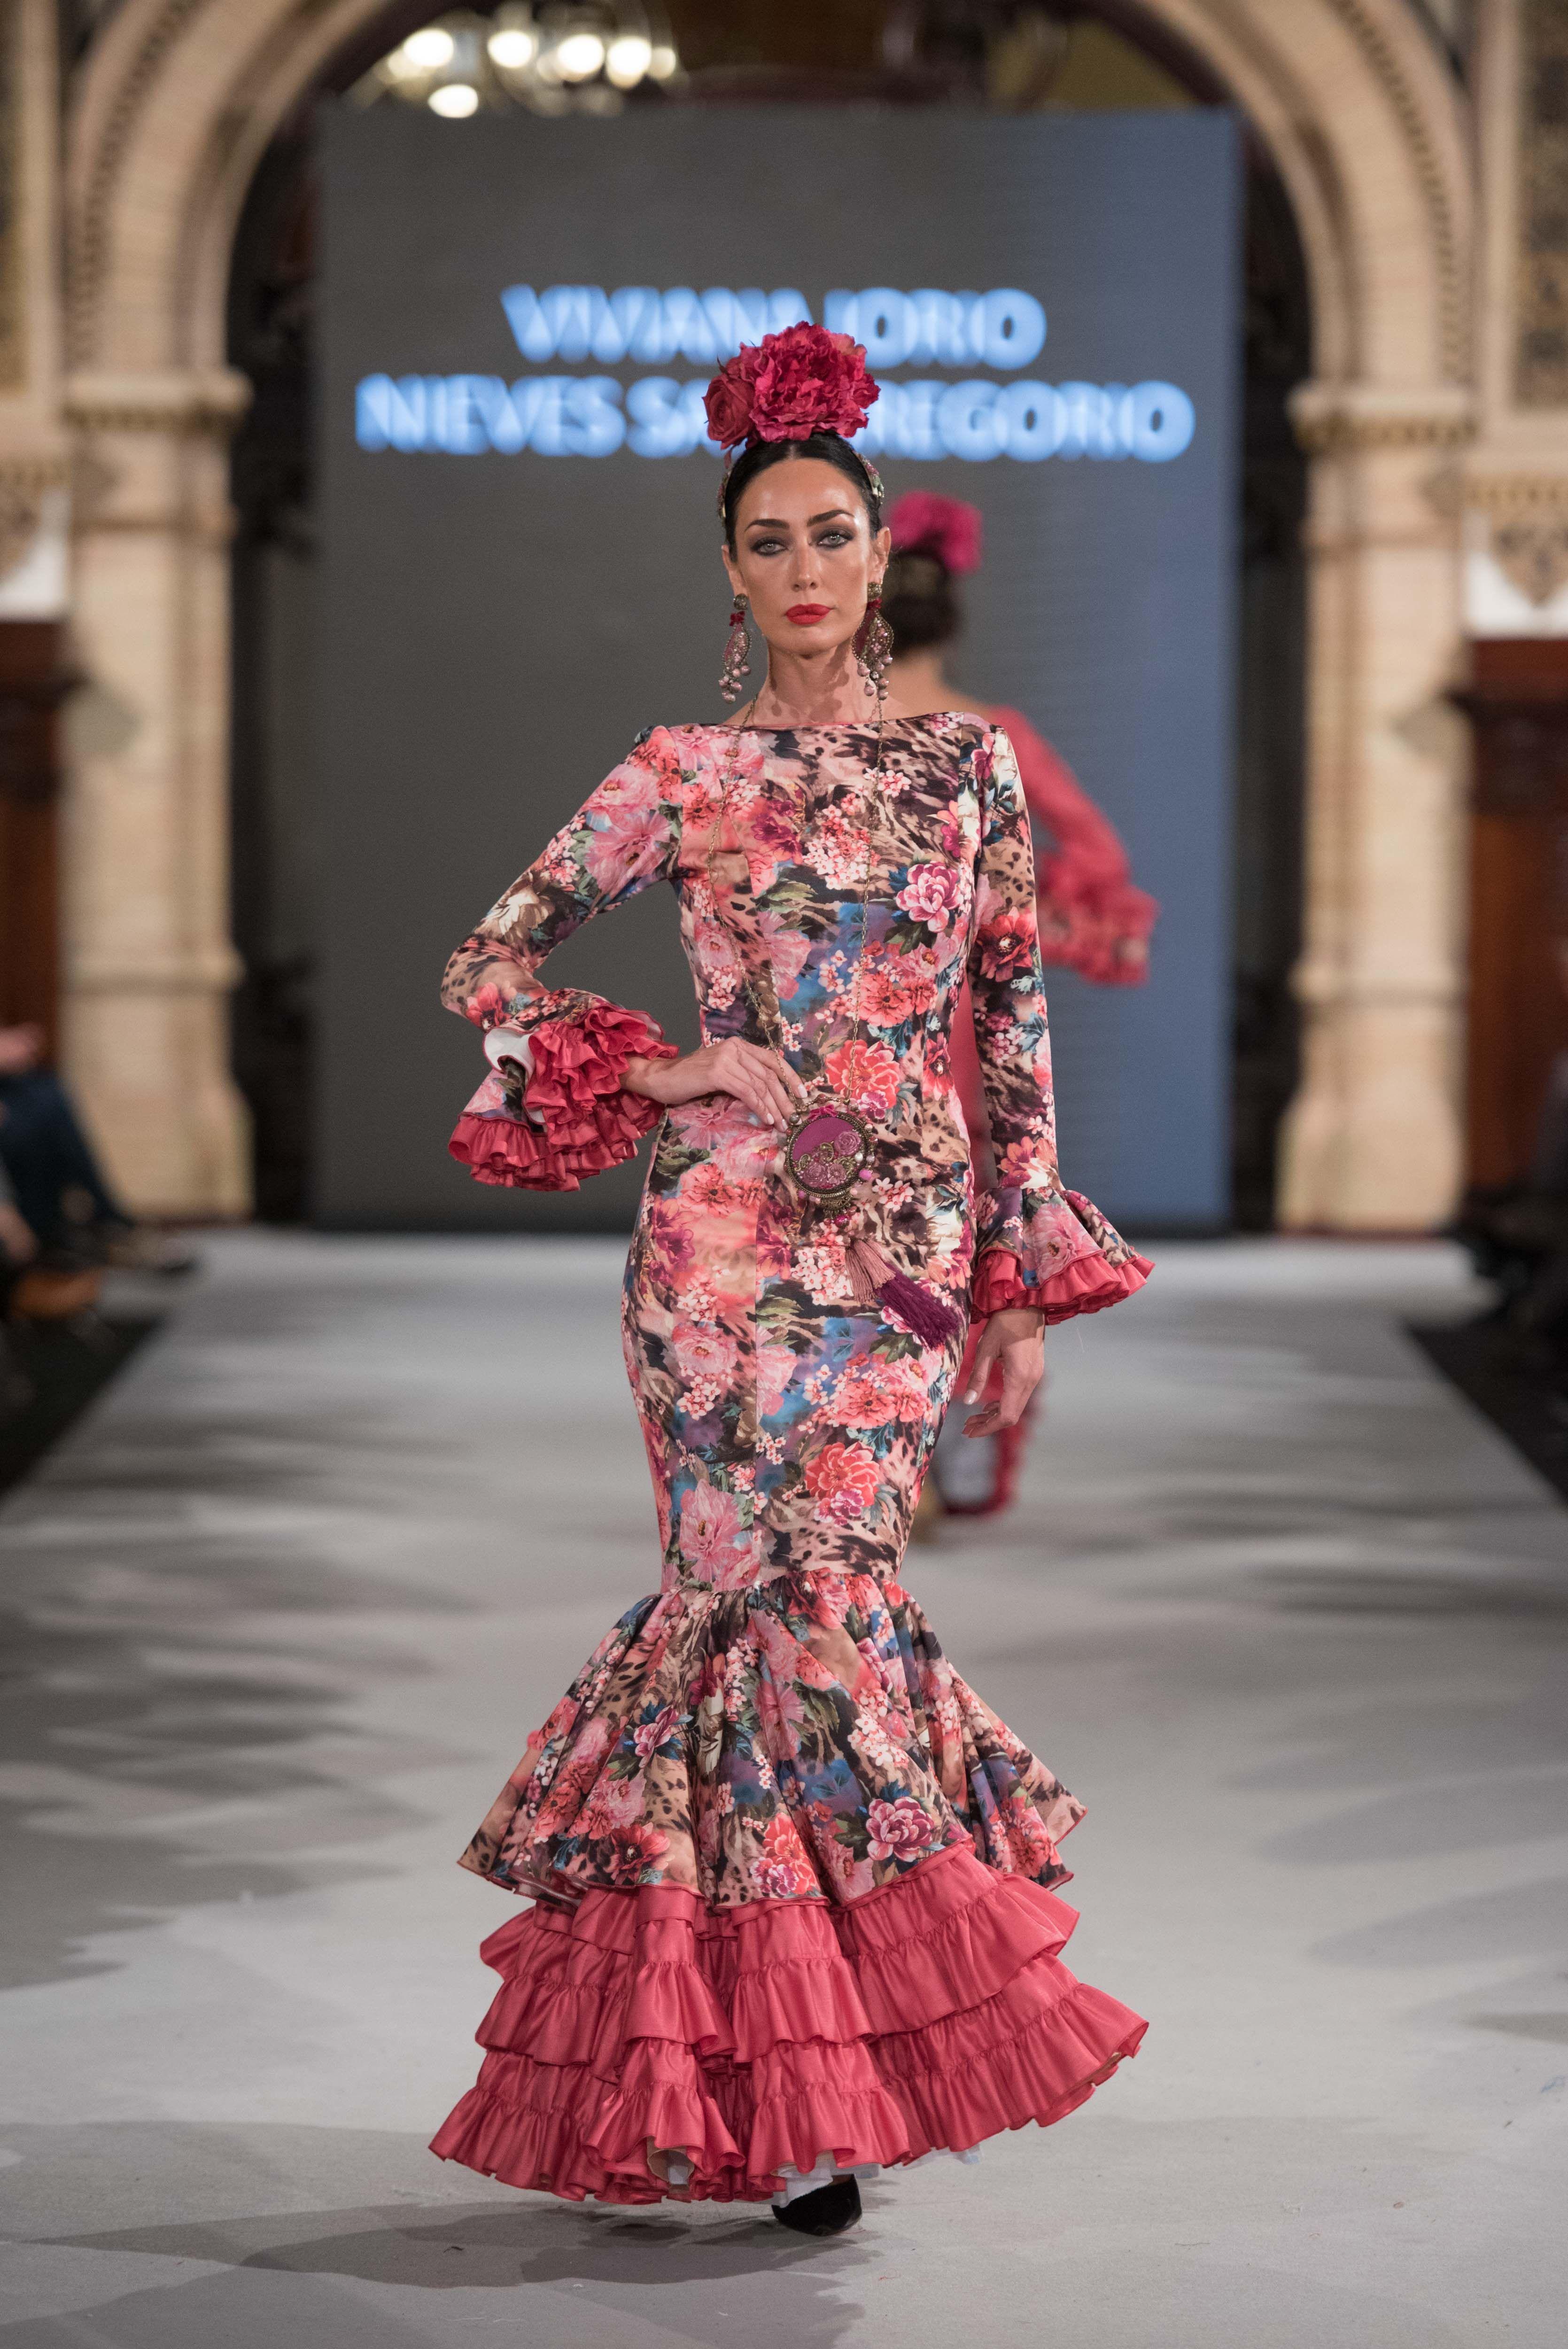 Viviana Iorio We Love Flamenco 2018 Sevilla   Flamenco